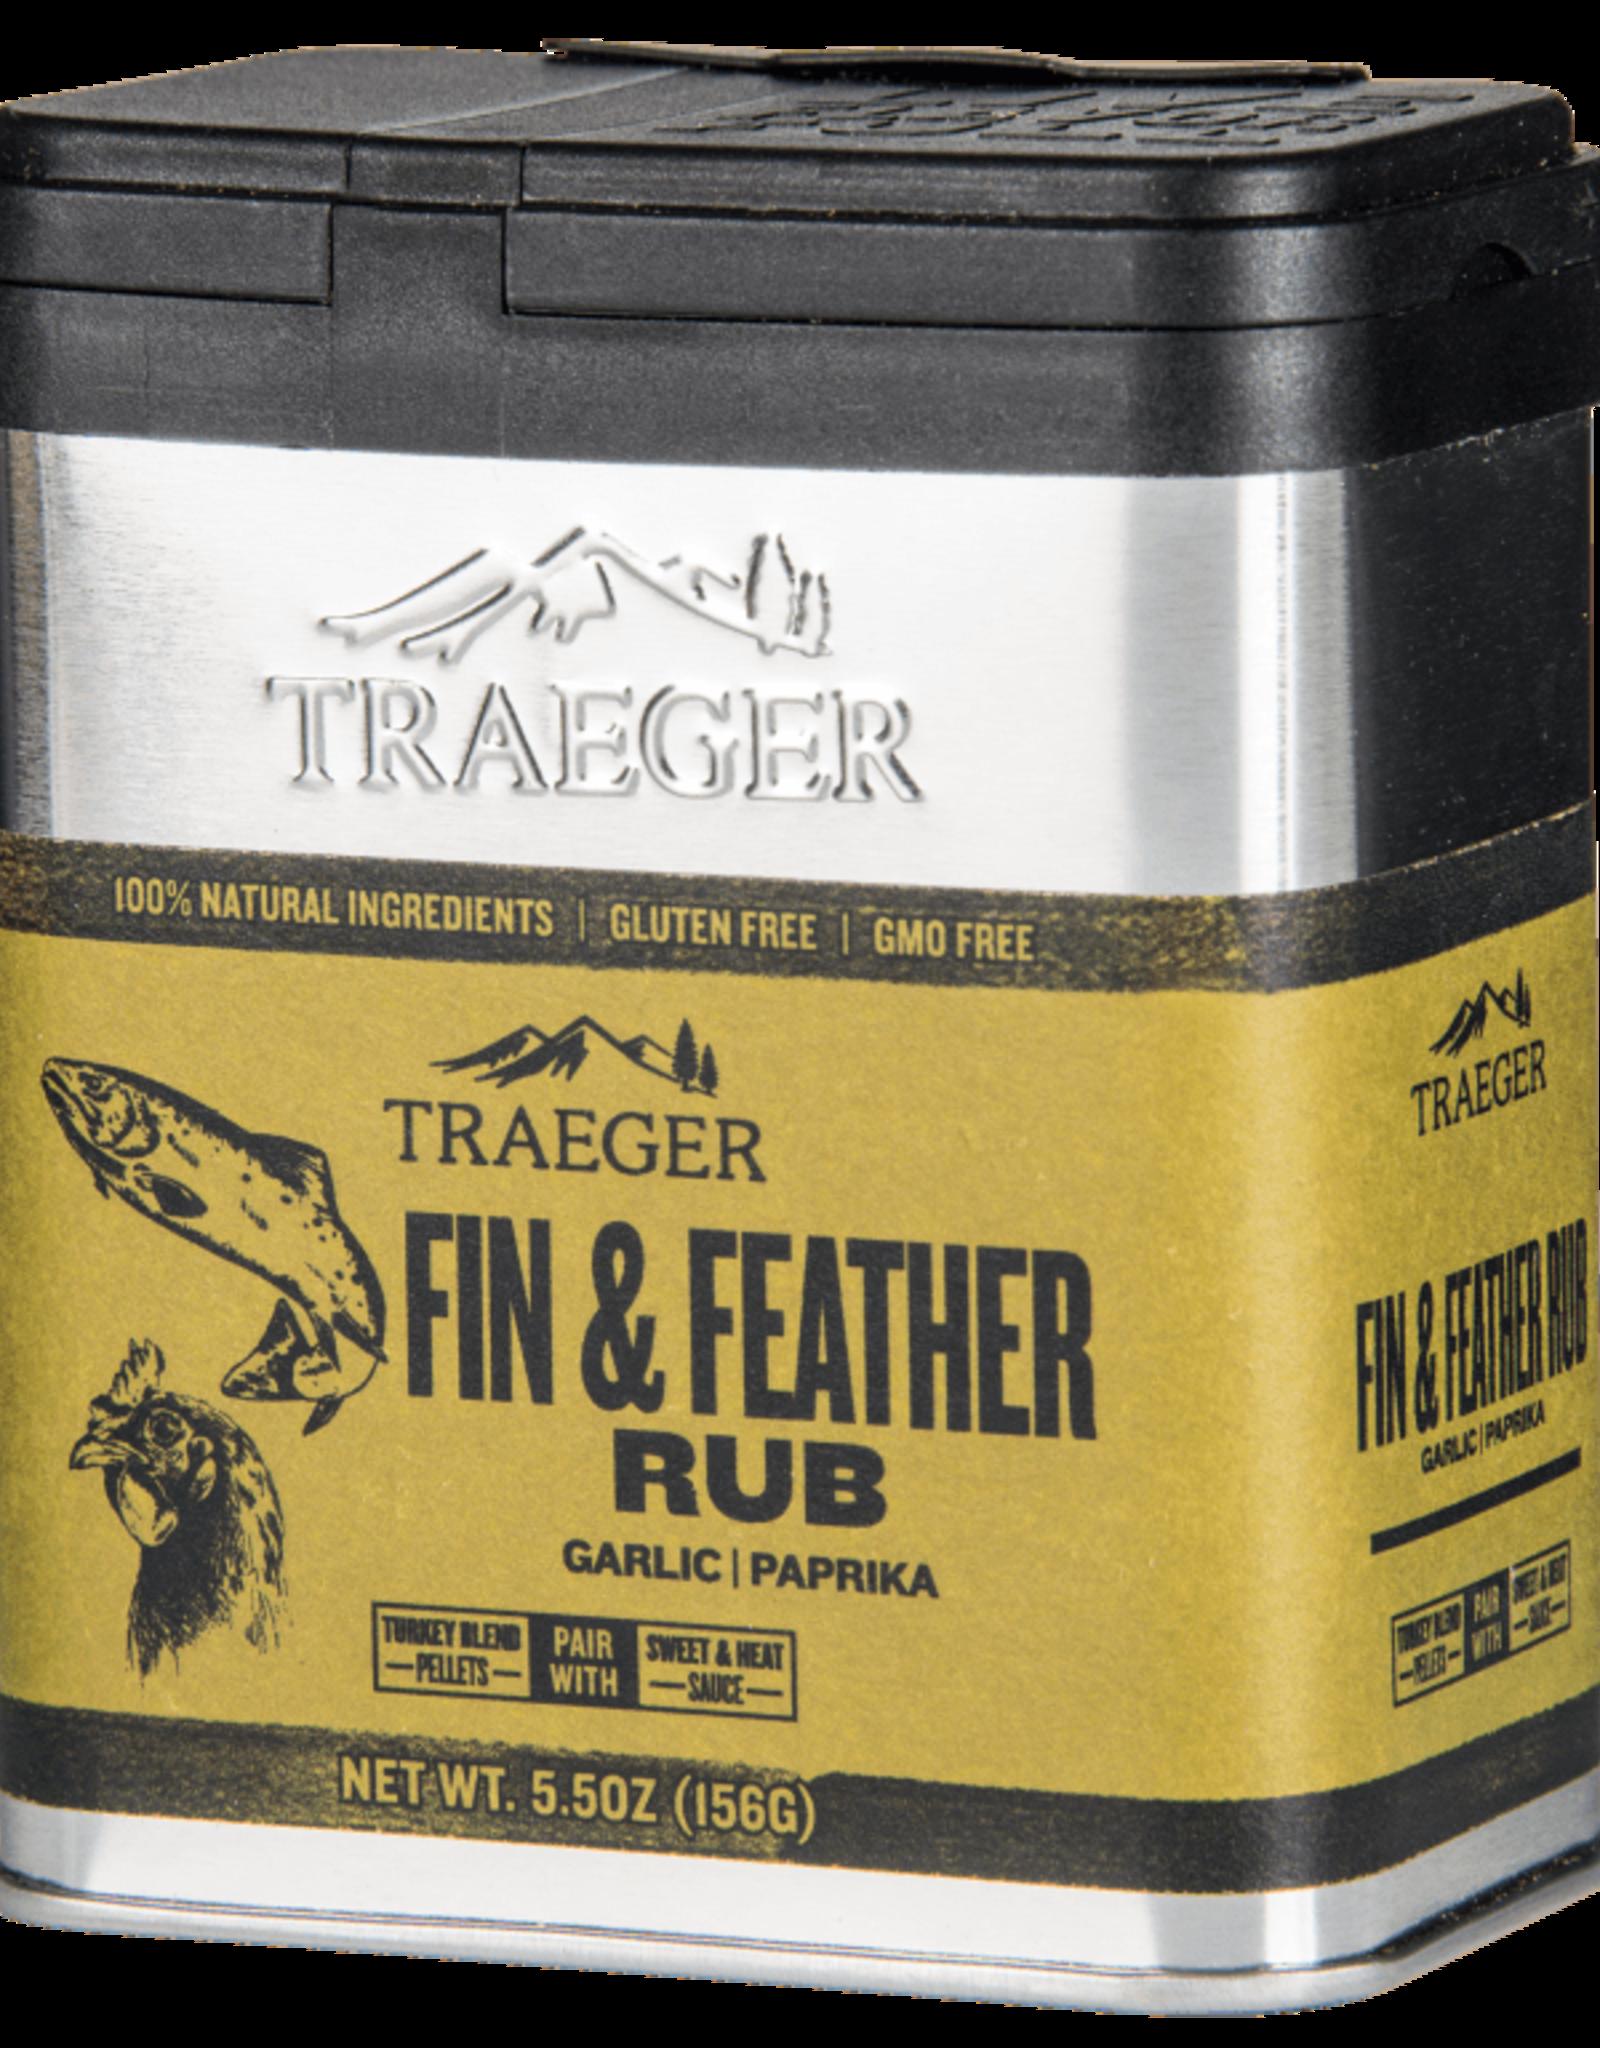 Traeger Traeger Fin & Feather Rub - SPC176